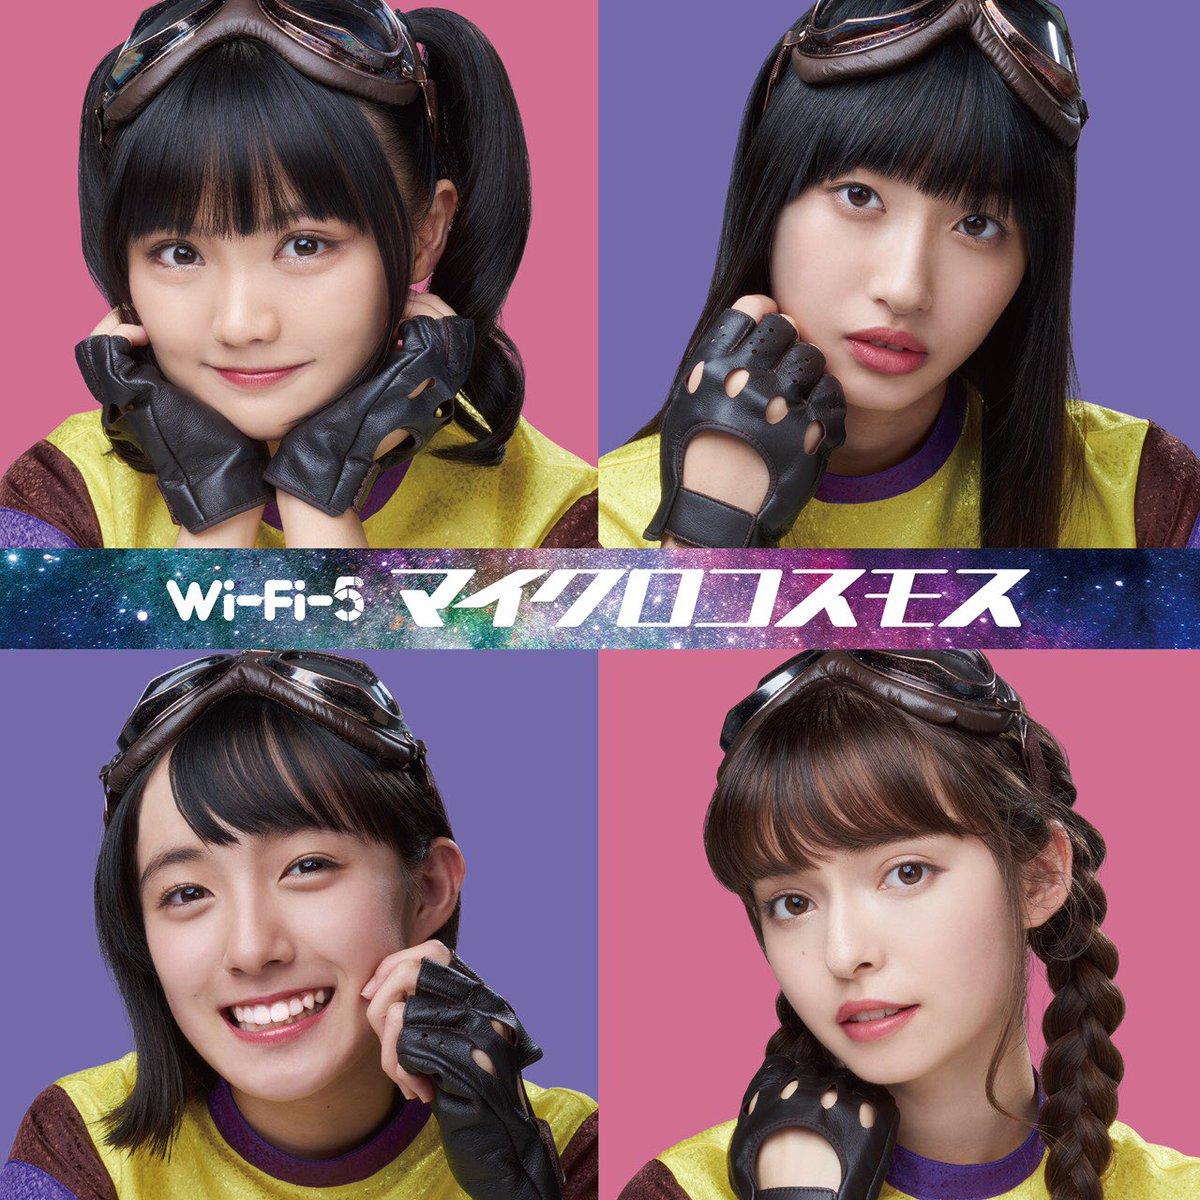 Wi-Fi-5